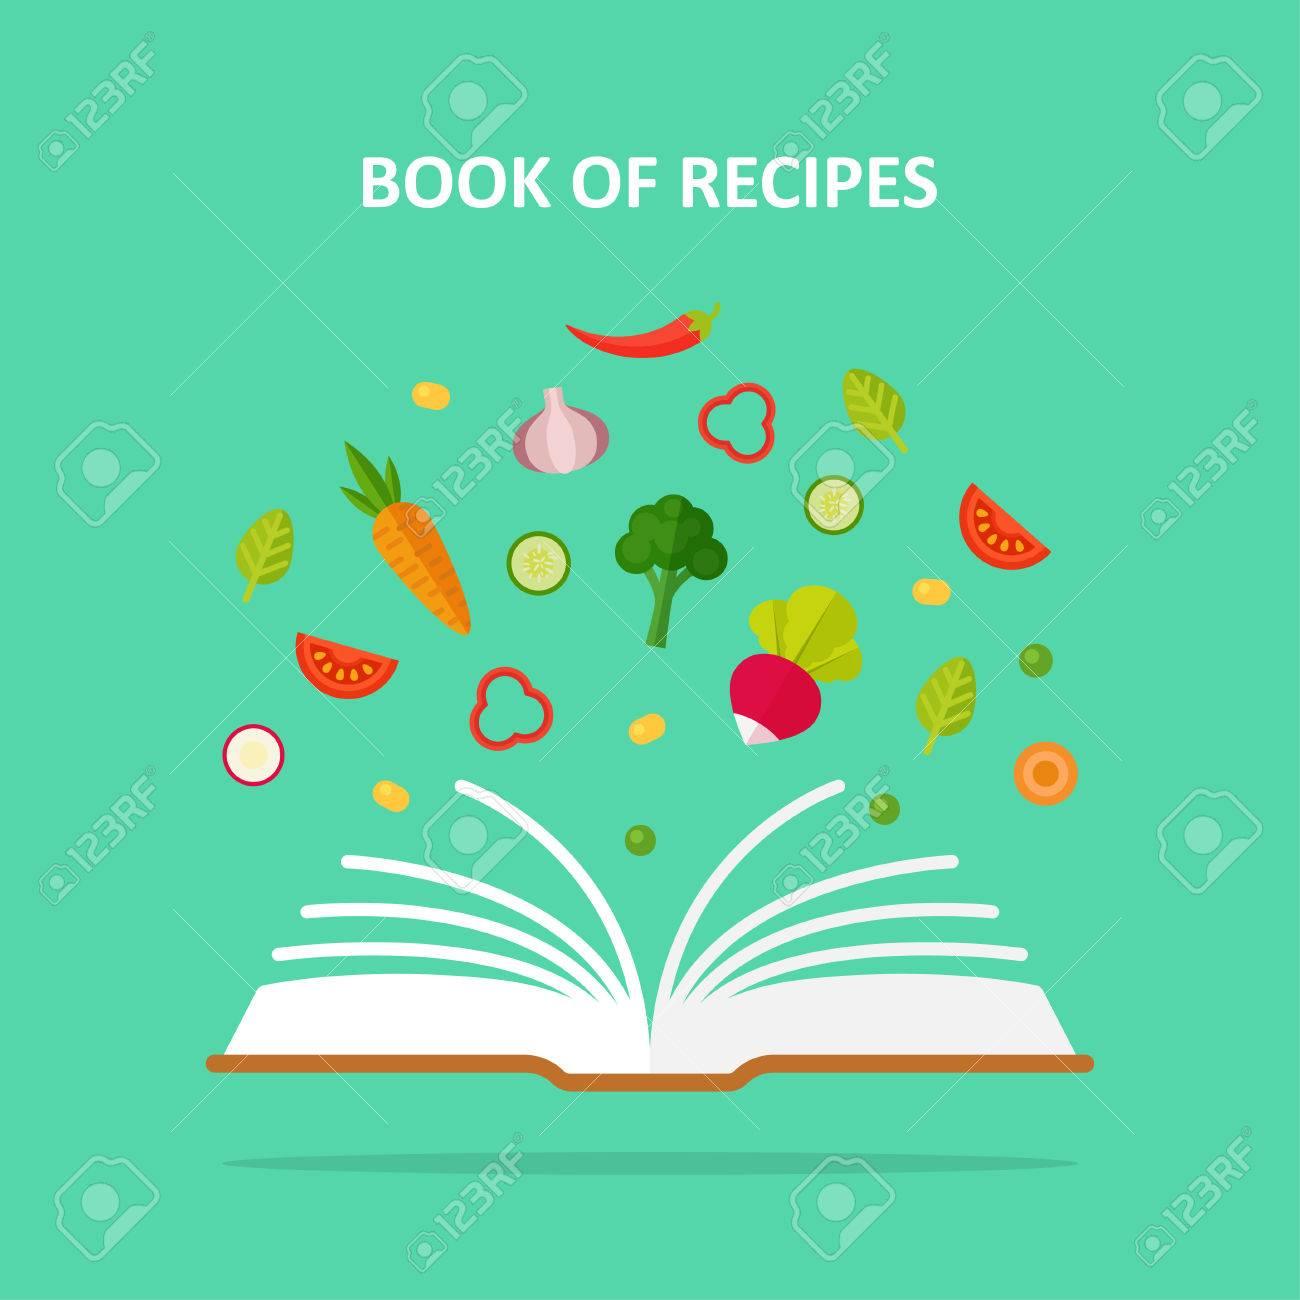 Buch Der Rezepte Vektor Konzept Illustration Vegetarismus Gemuse